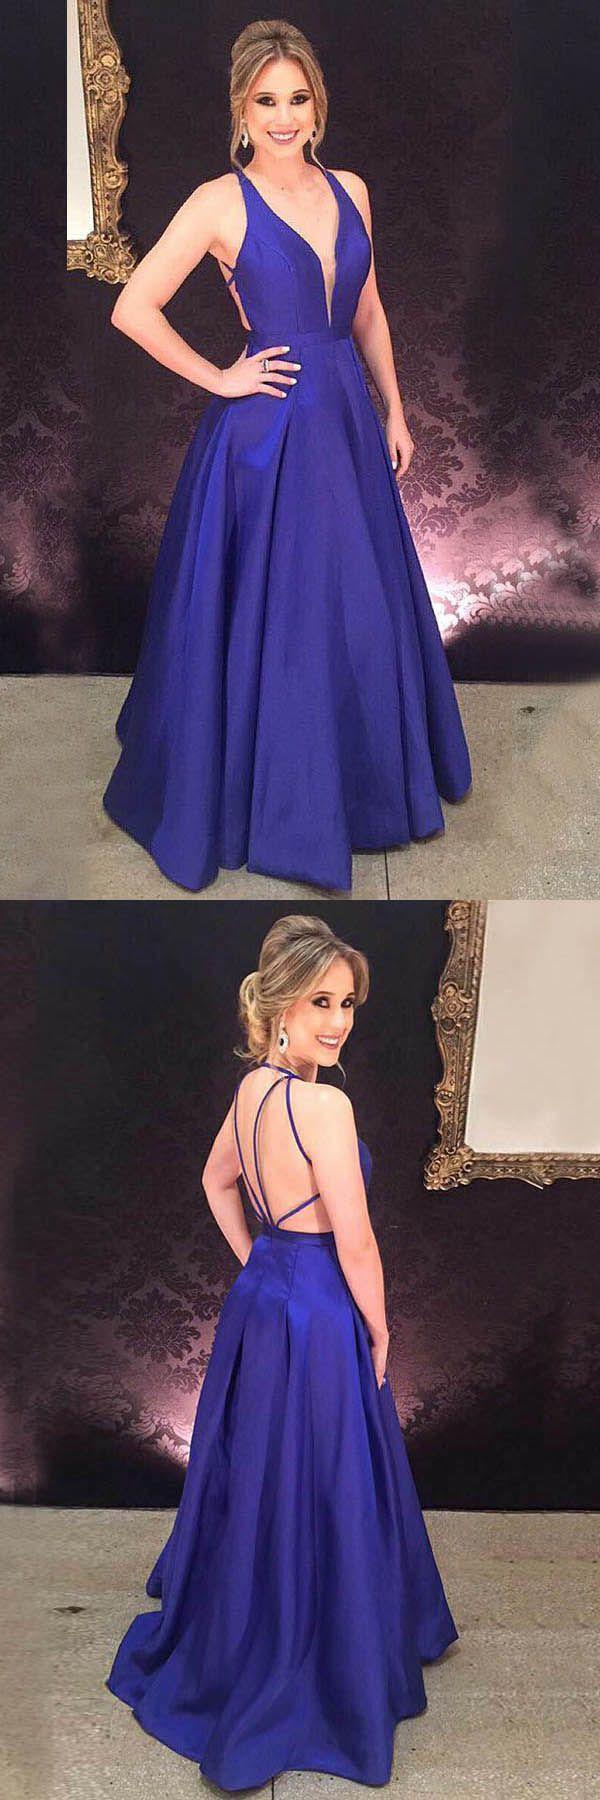 A-Line Deep V-Neck Royal Blue Satin Pleats Prom Dress Evening Dress PG472 #satin #prom #party #dress #fashion #cheap #cocktail